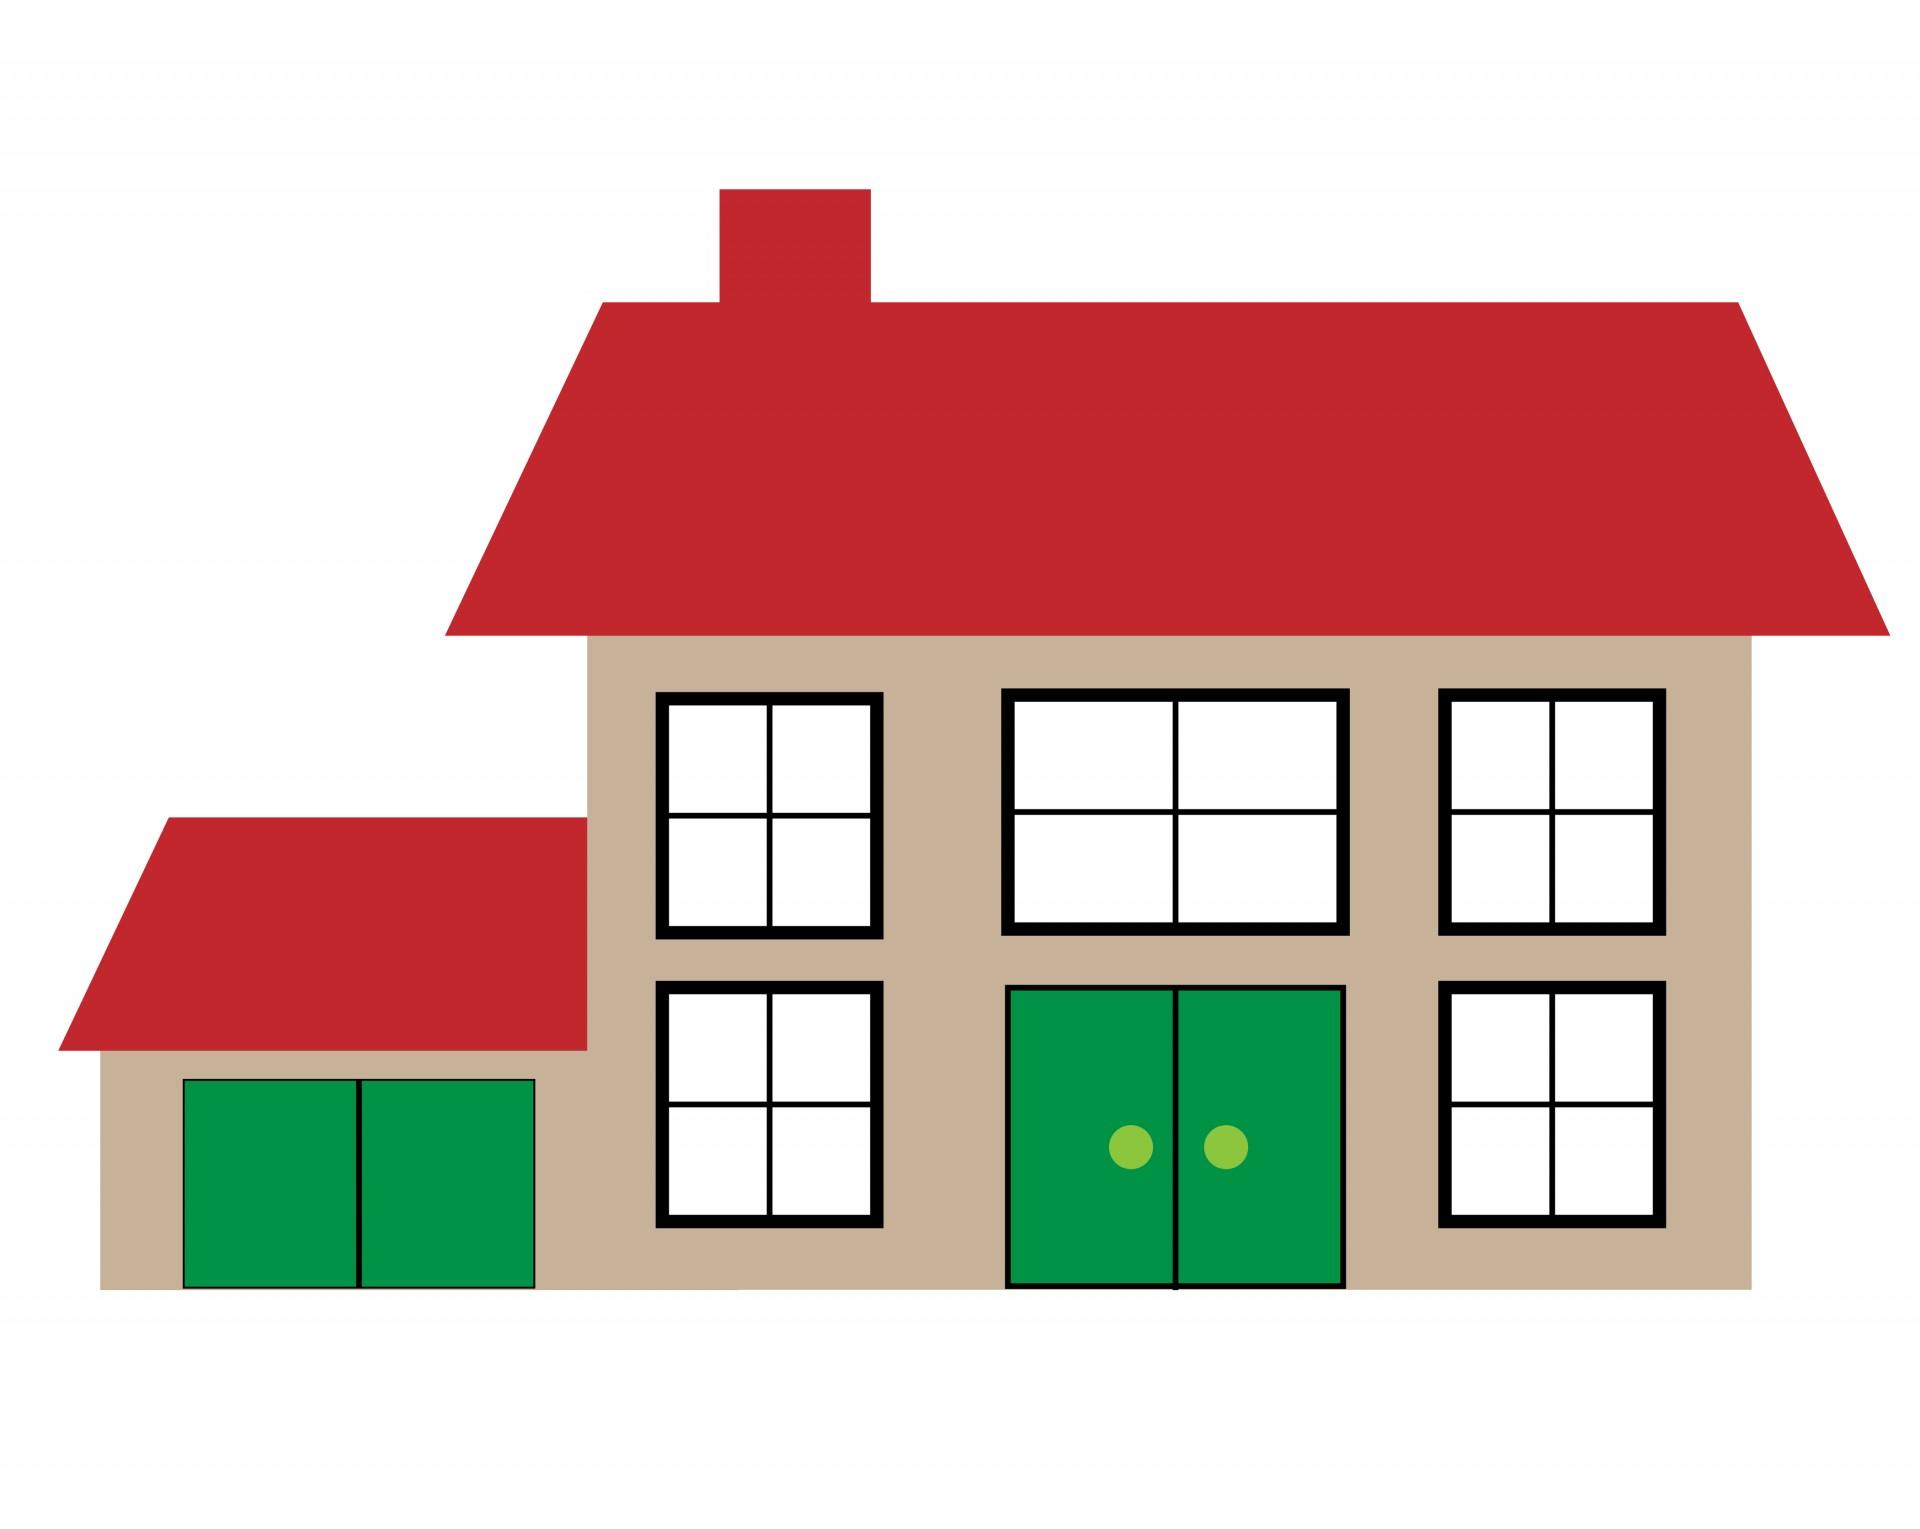 House Illustration Clipart-House Illustration Clipart-3